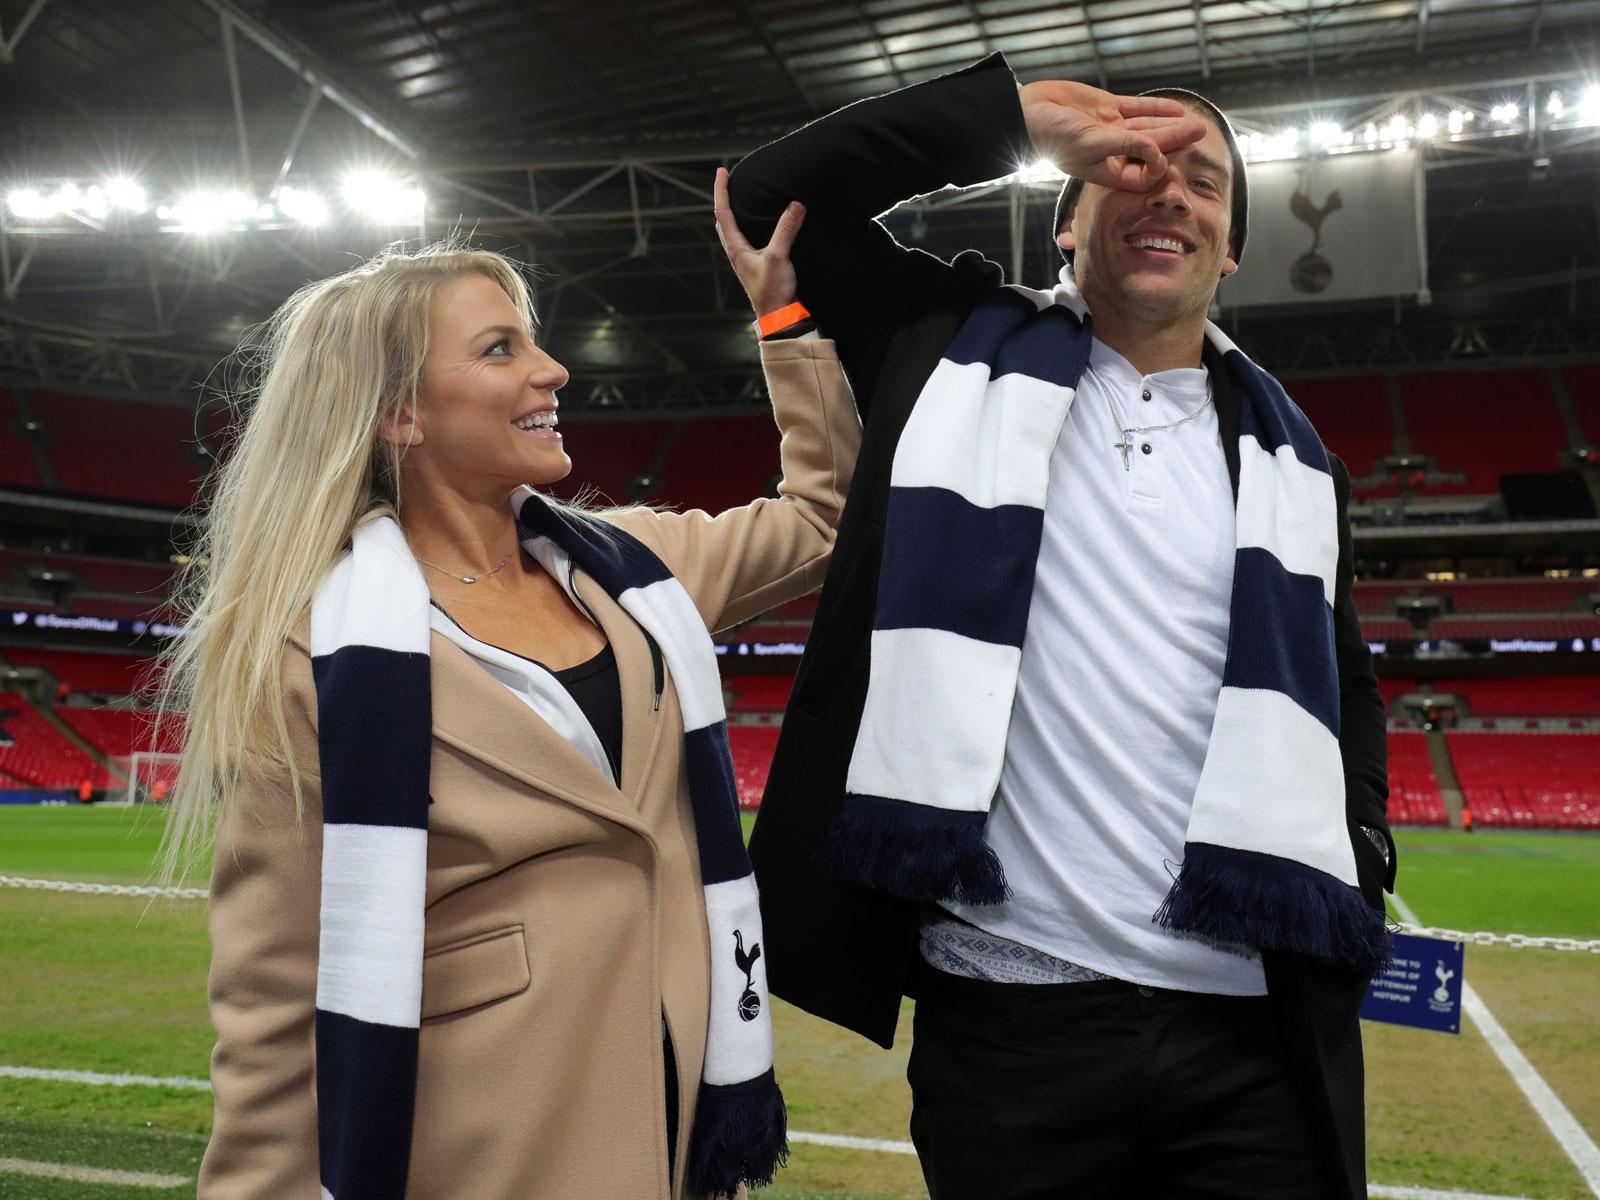 Julie and Zach Ertz at Wembley Stadium before Tottenham plays Manchester City